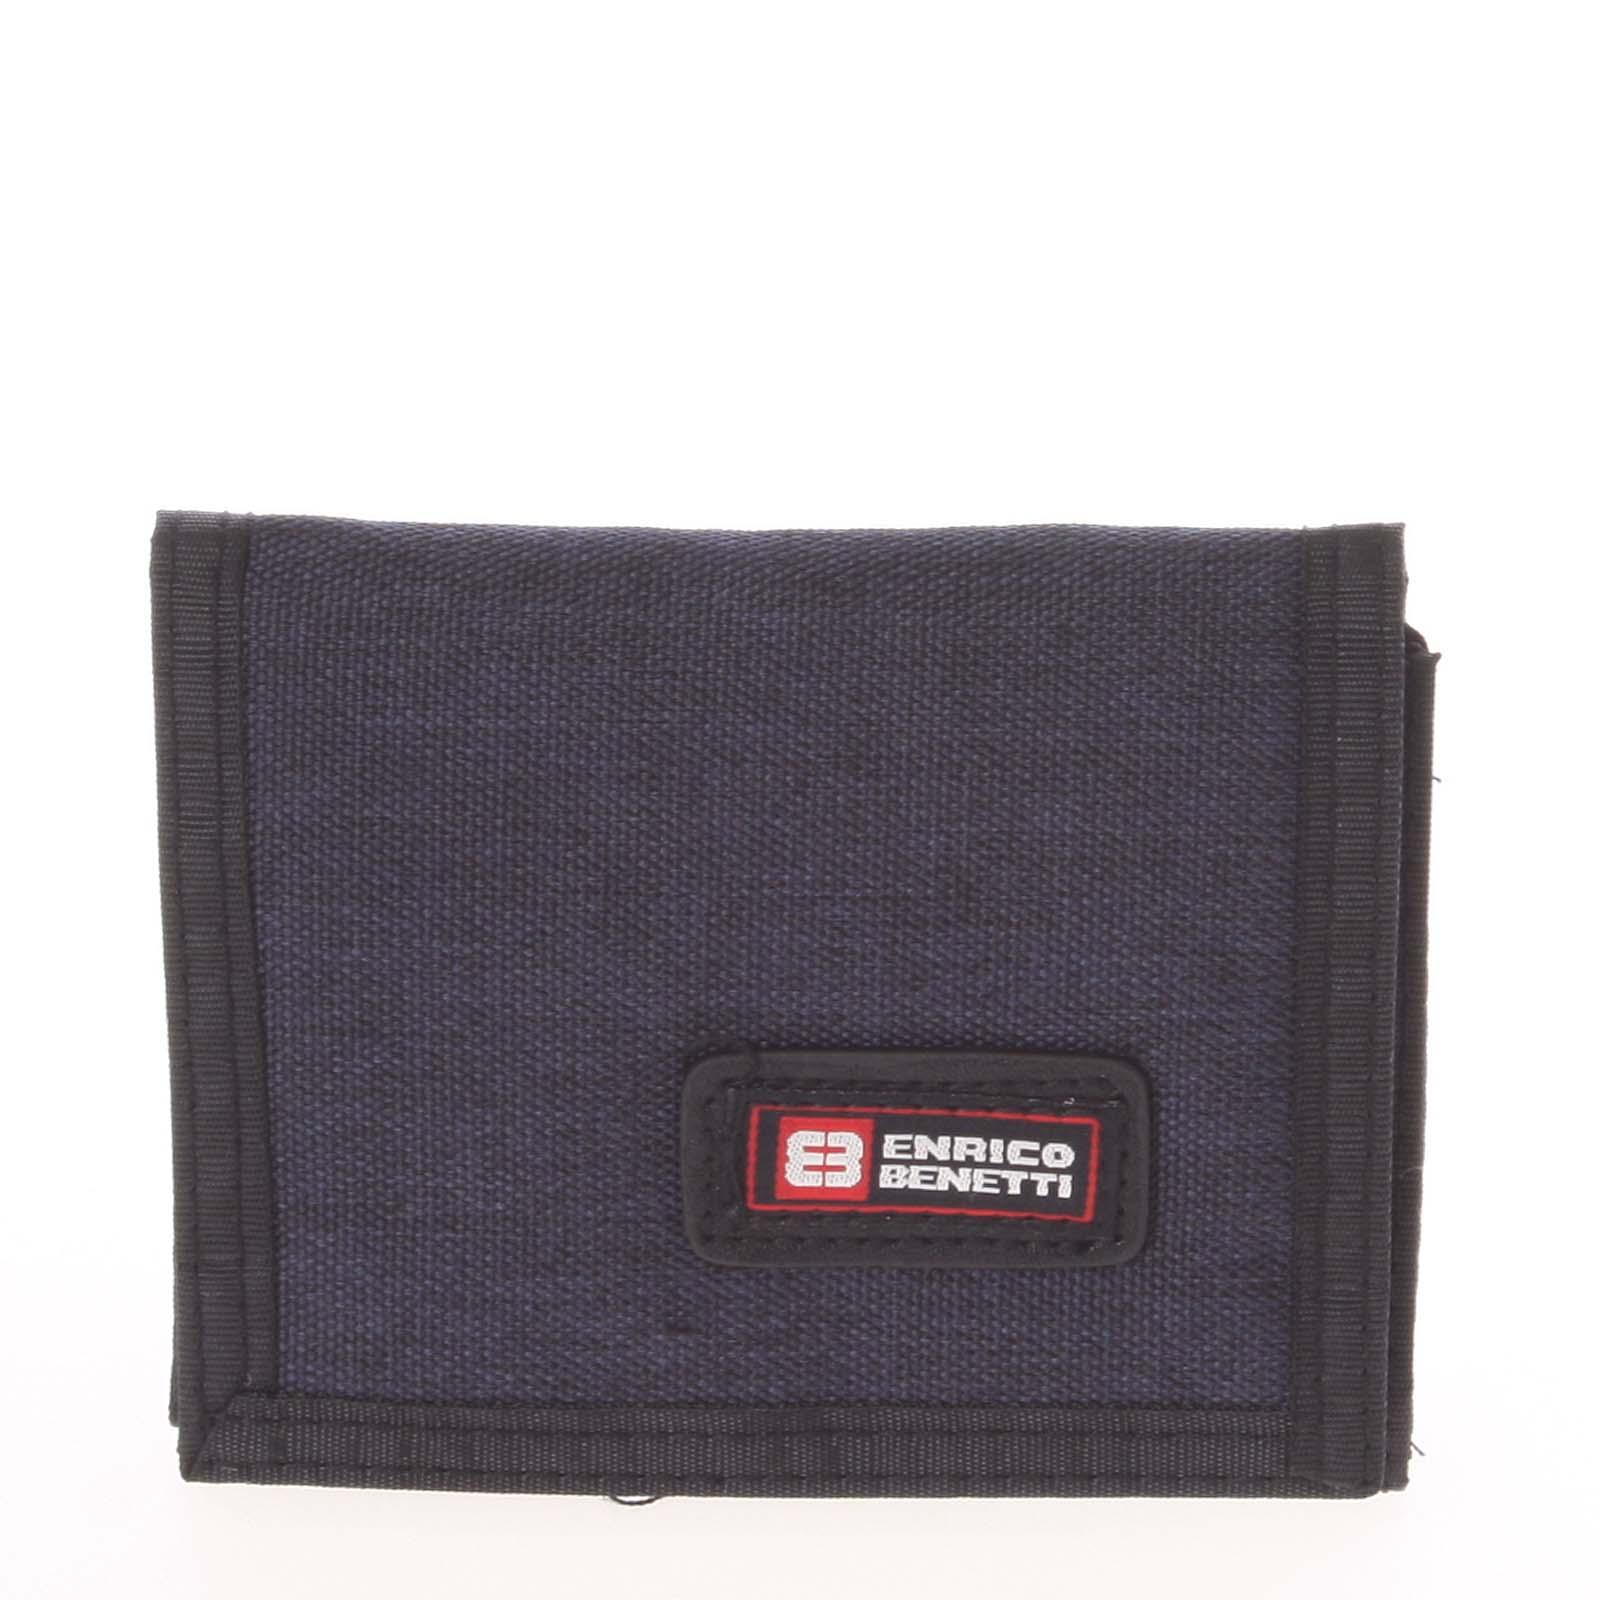 Peňaženka látková tmavo modrá - Enrico Benetti 4500